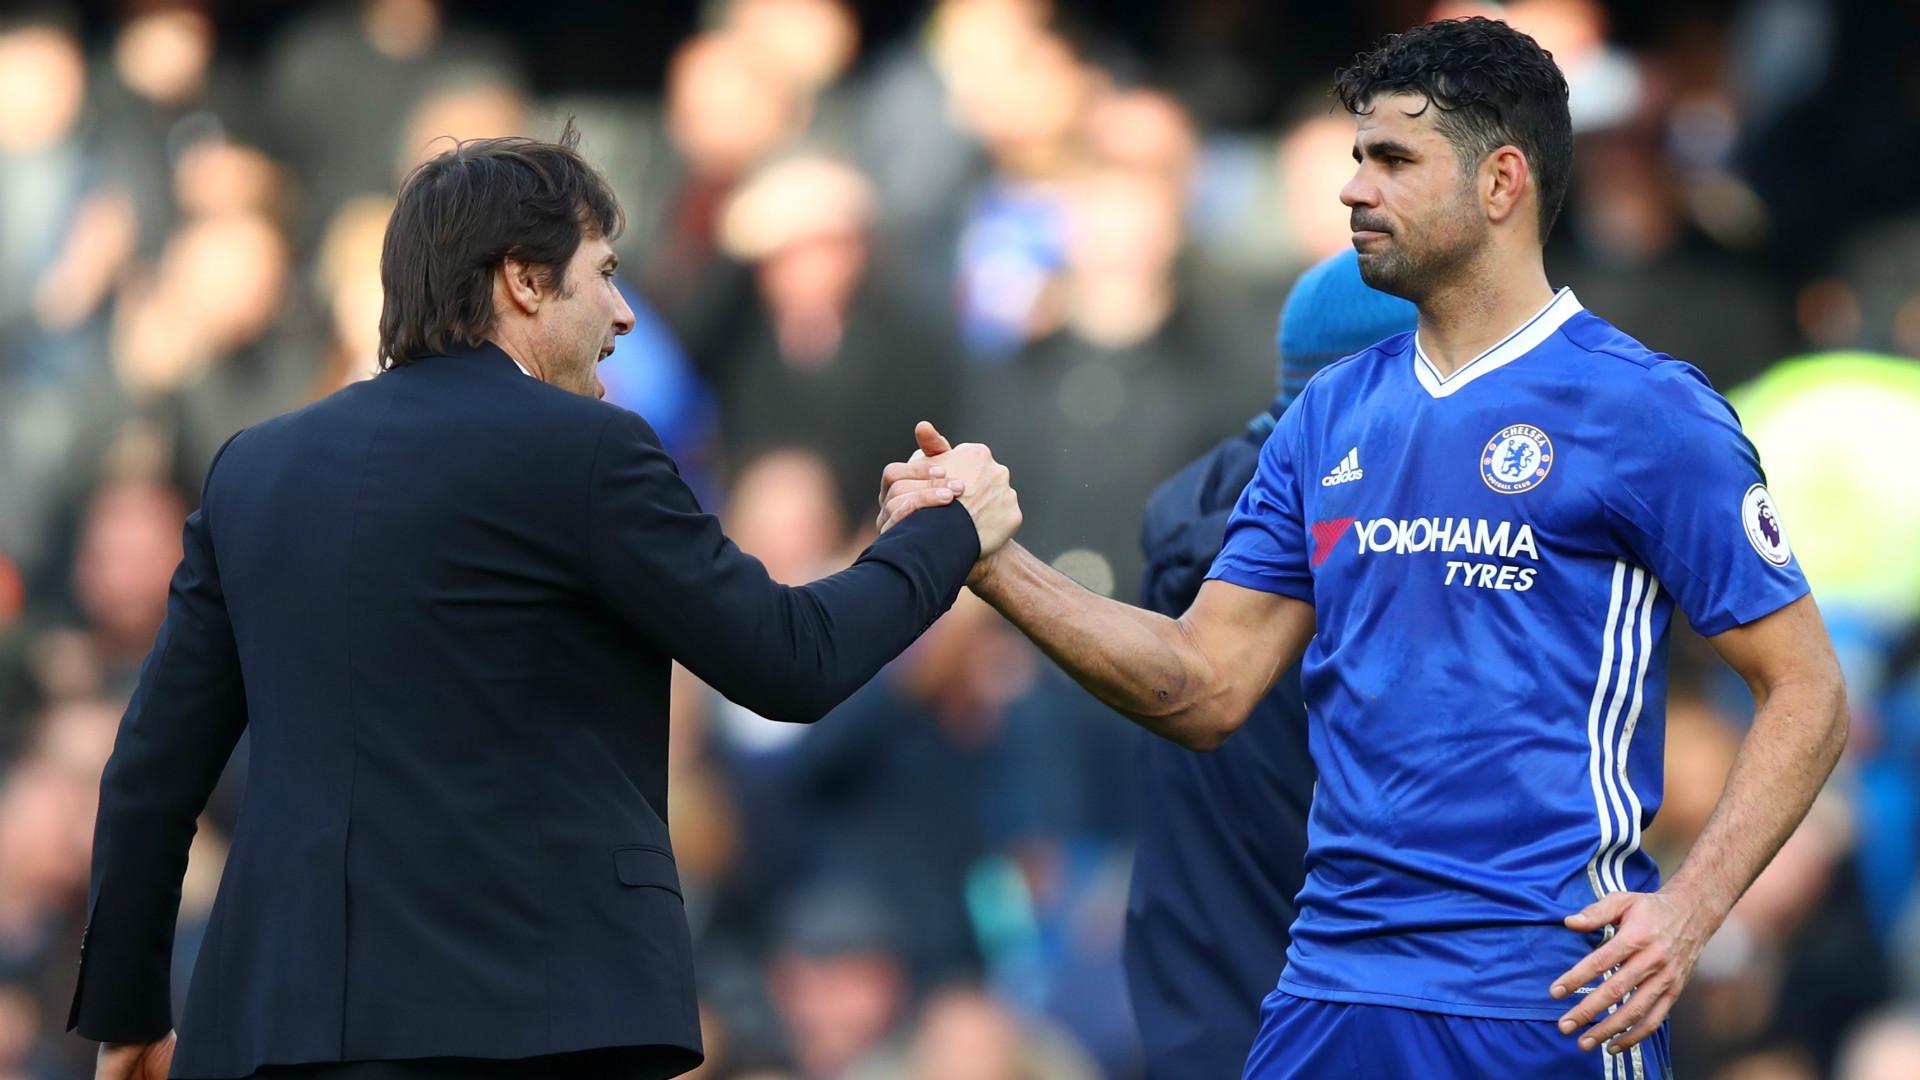 Alvaro Morata reveals he speaks to former Chelsea forward Diego